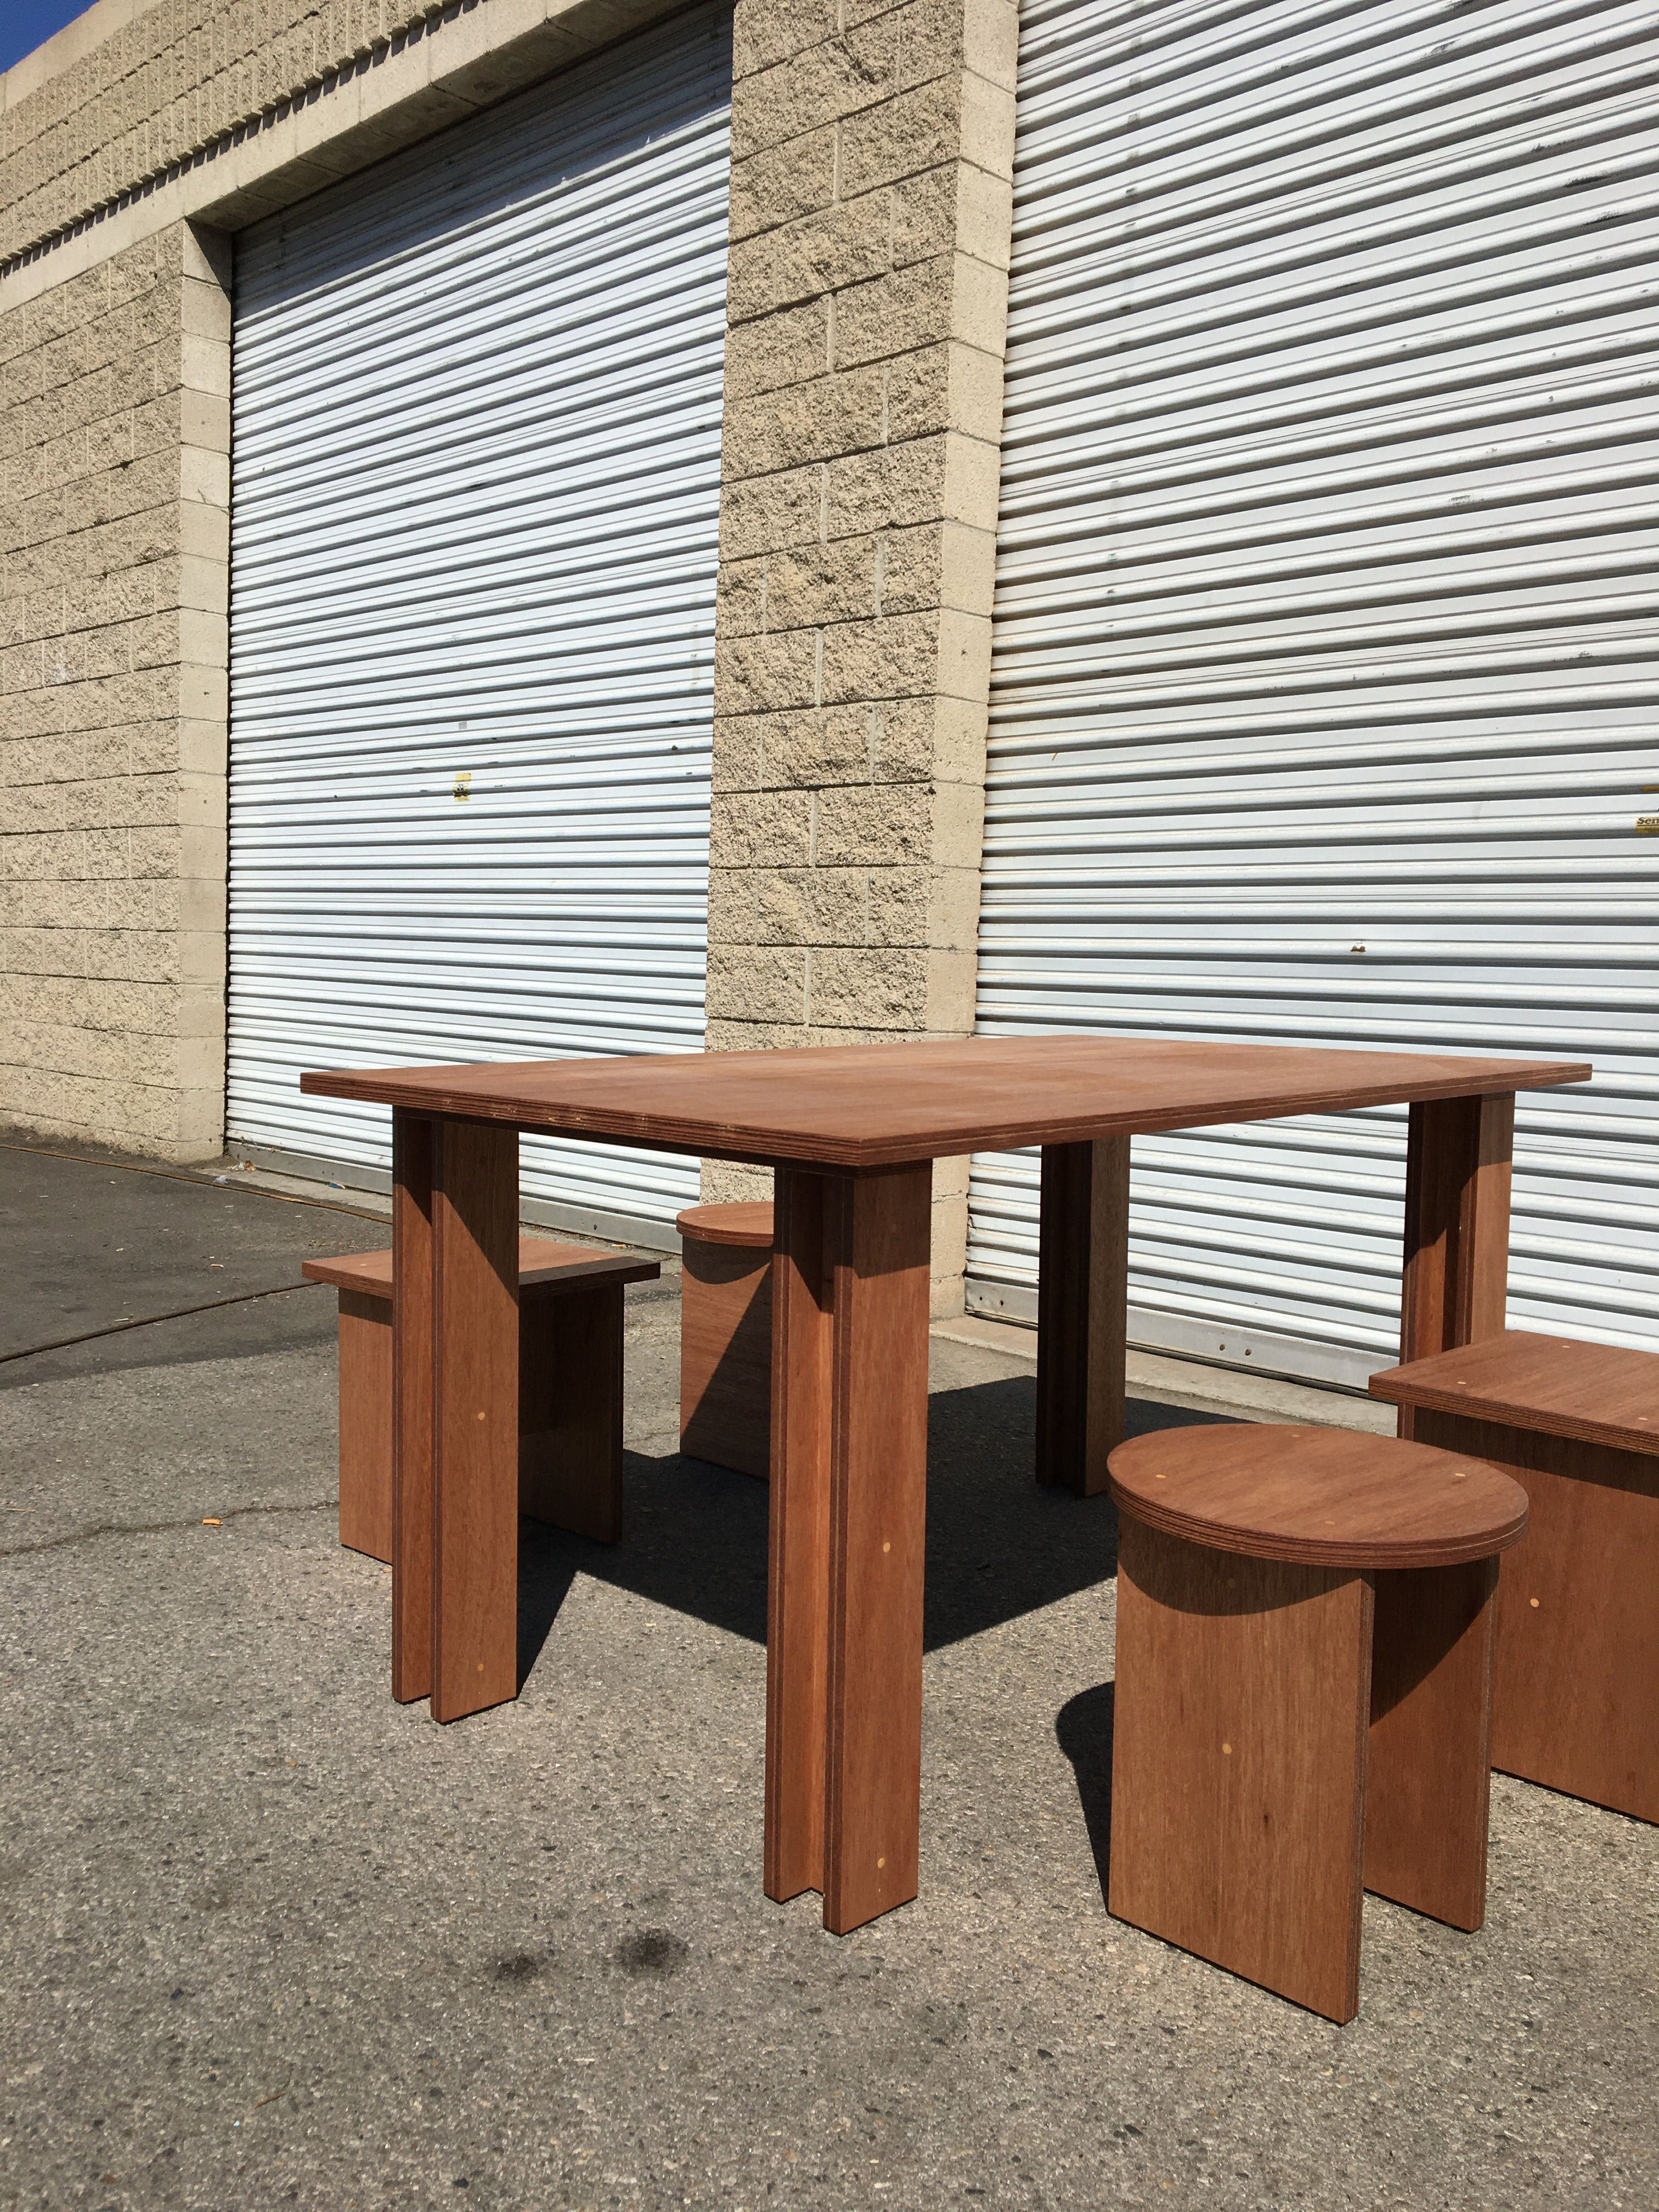 Outdoor I-Beam Set product image 4